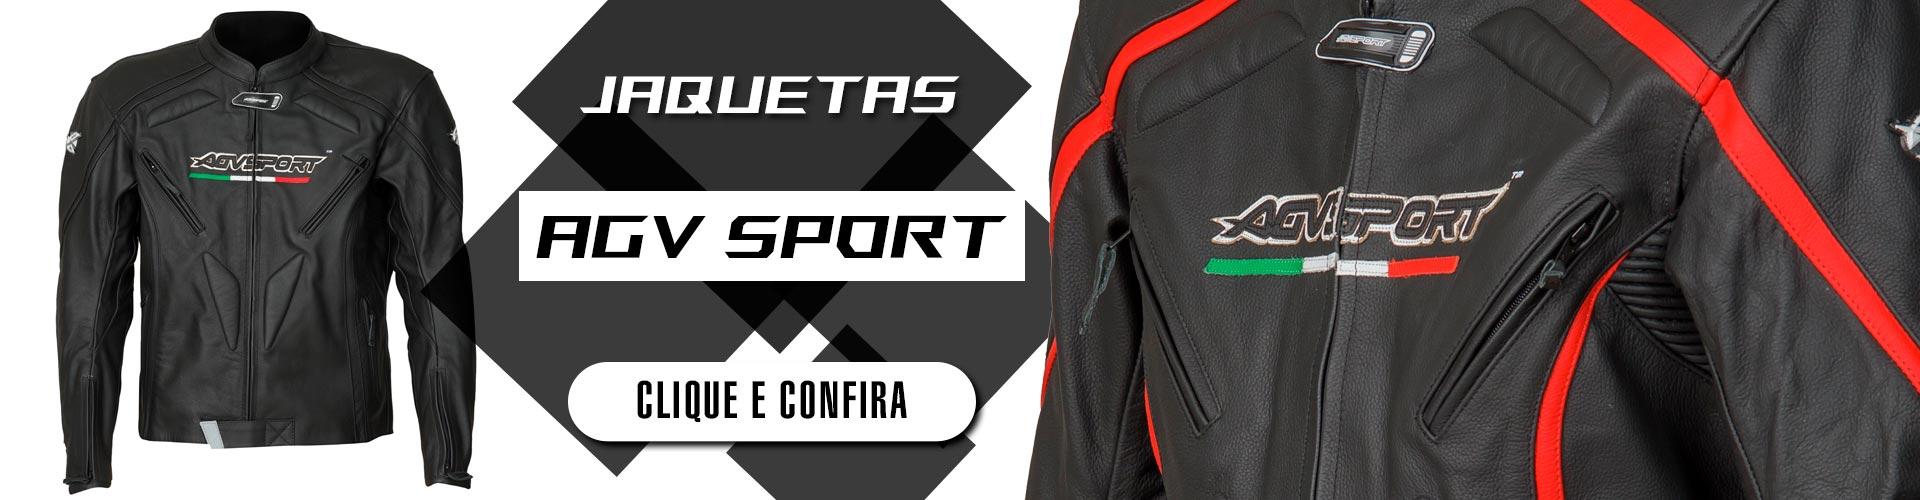 banner principal01 - AGV Sport